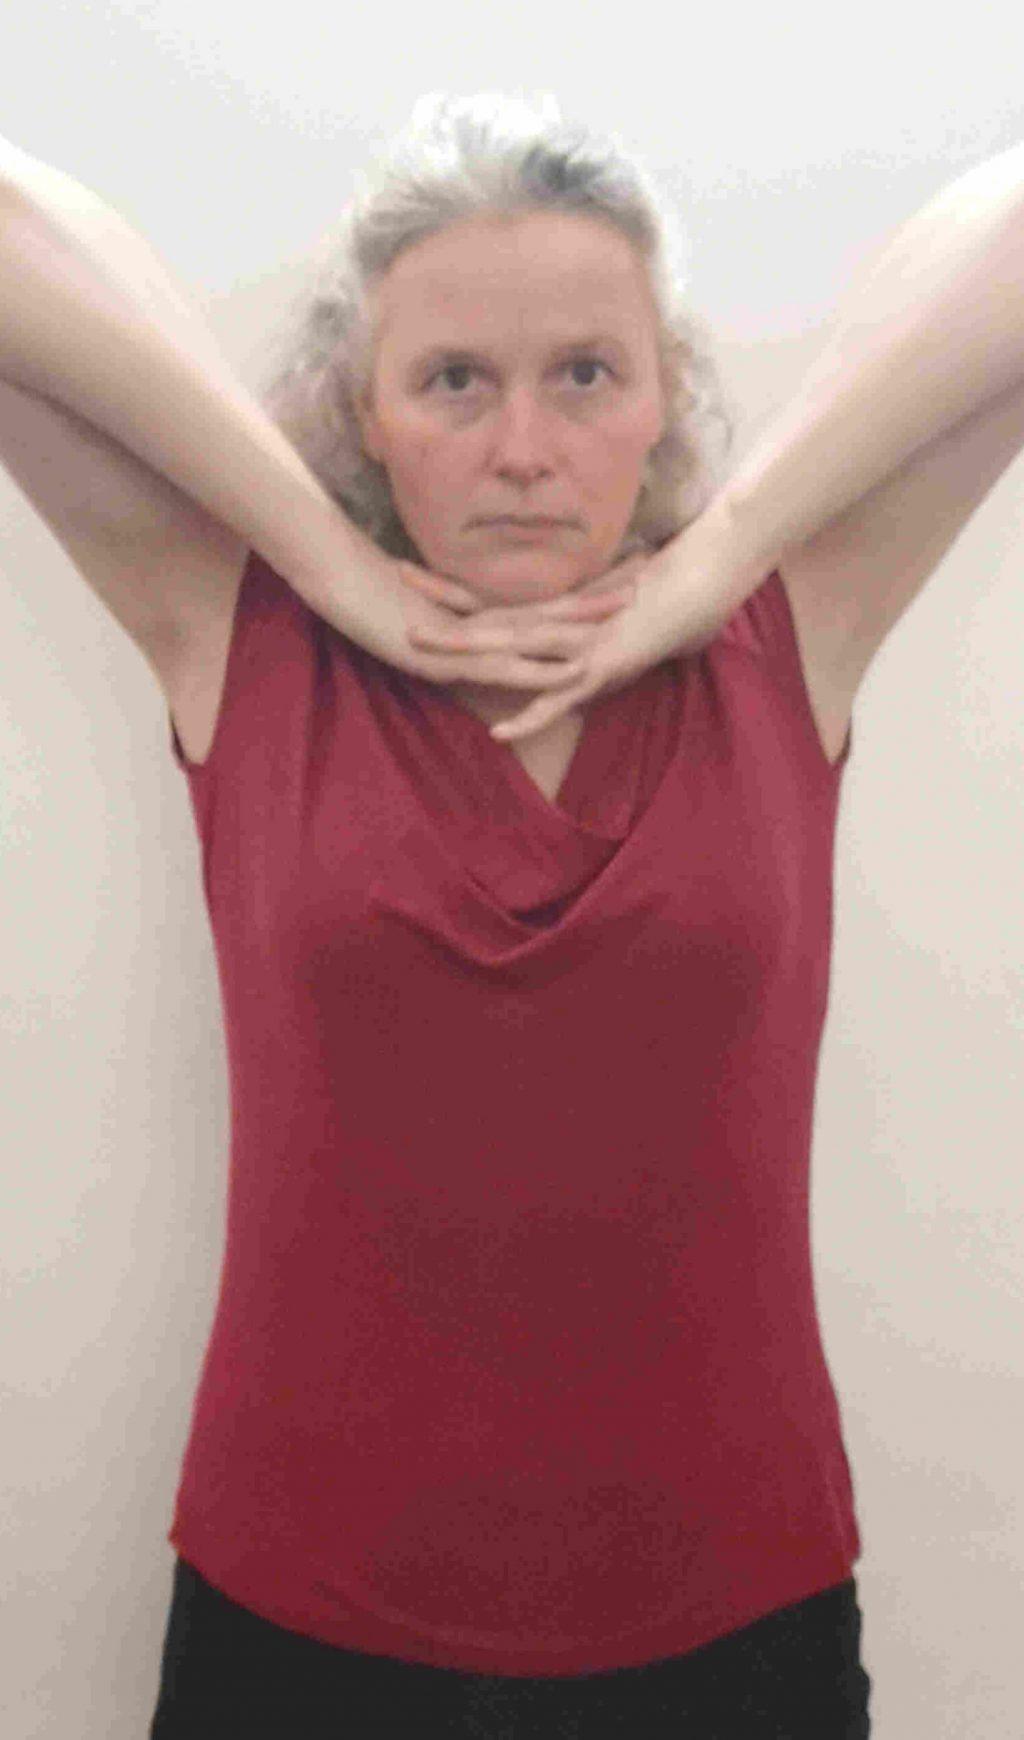 201219 Diaphragm stretch step 2 klein